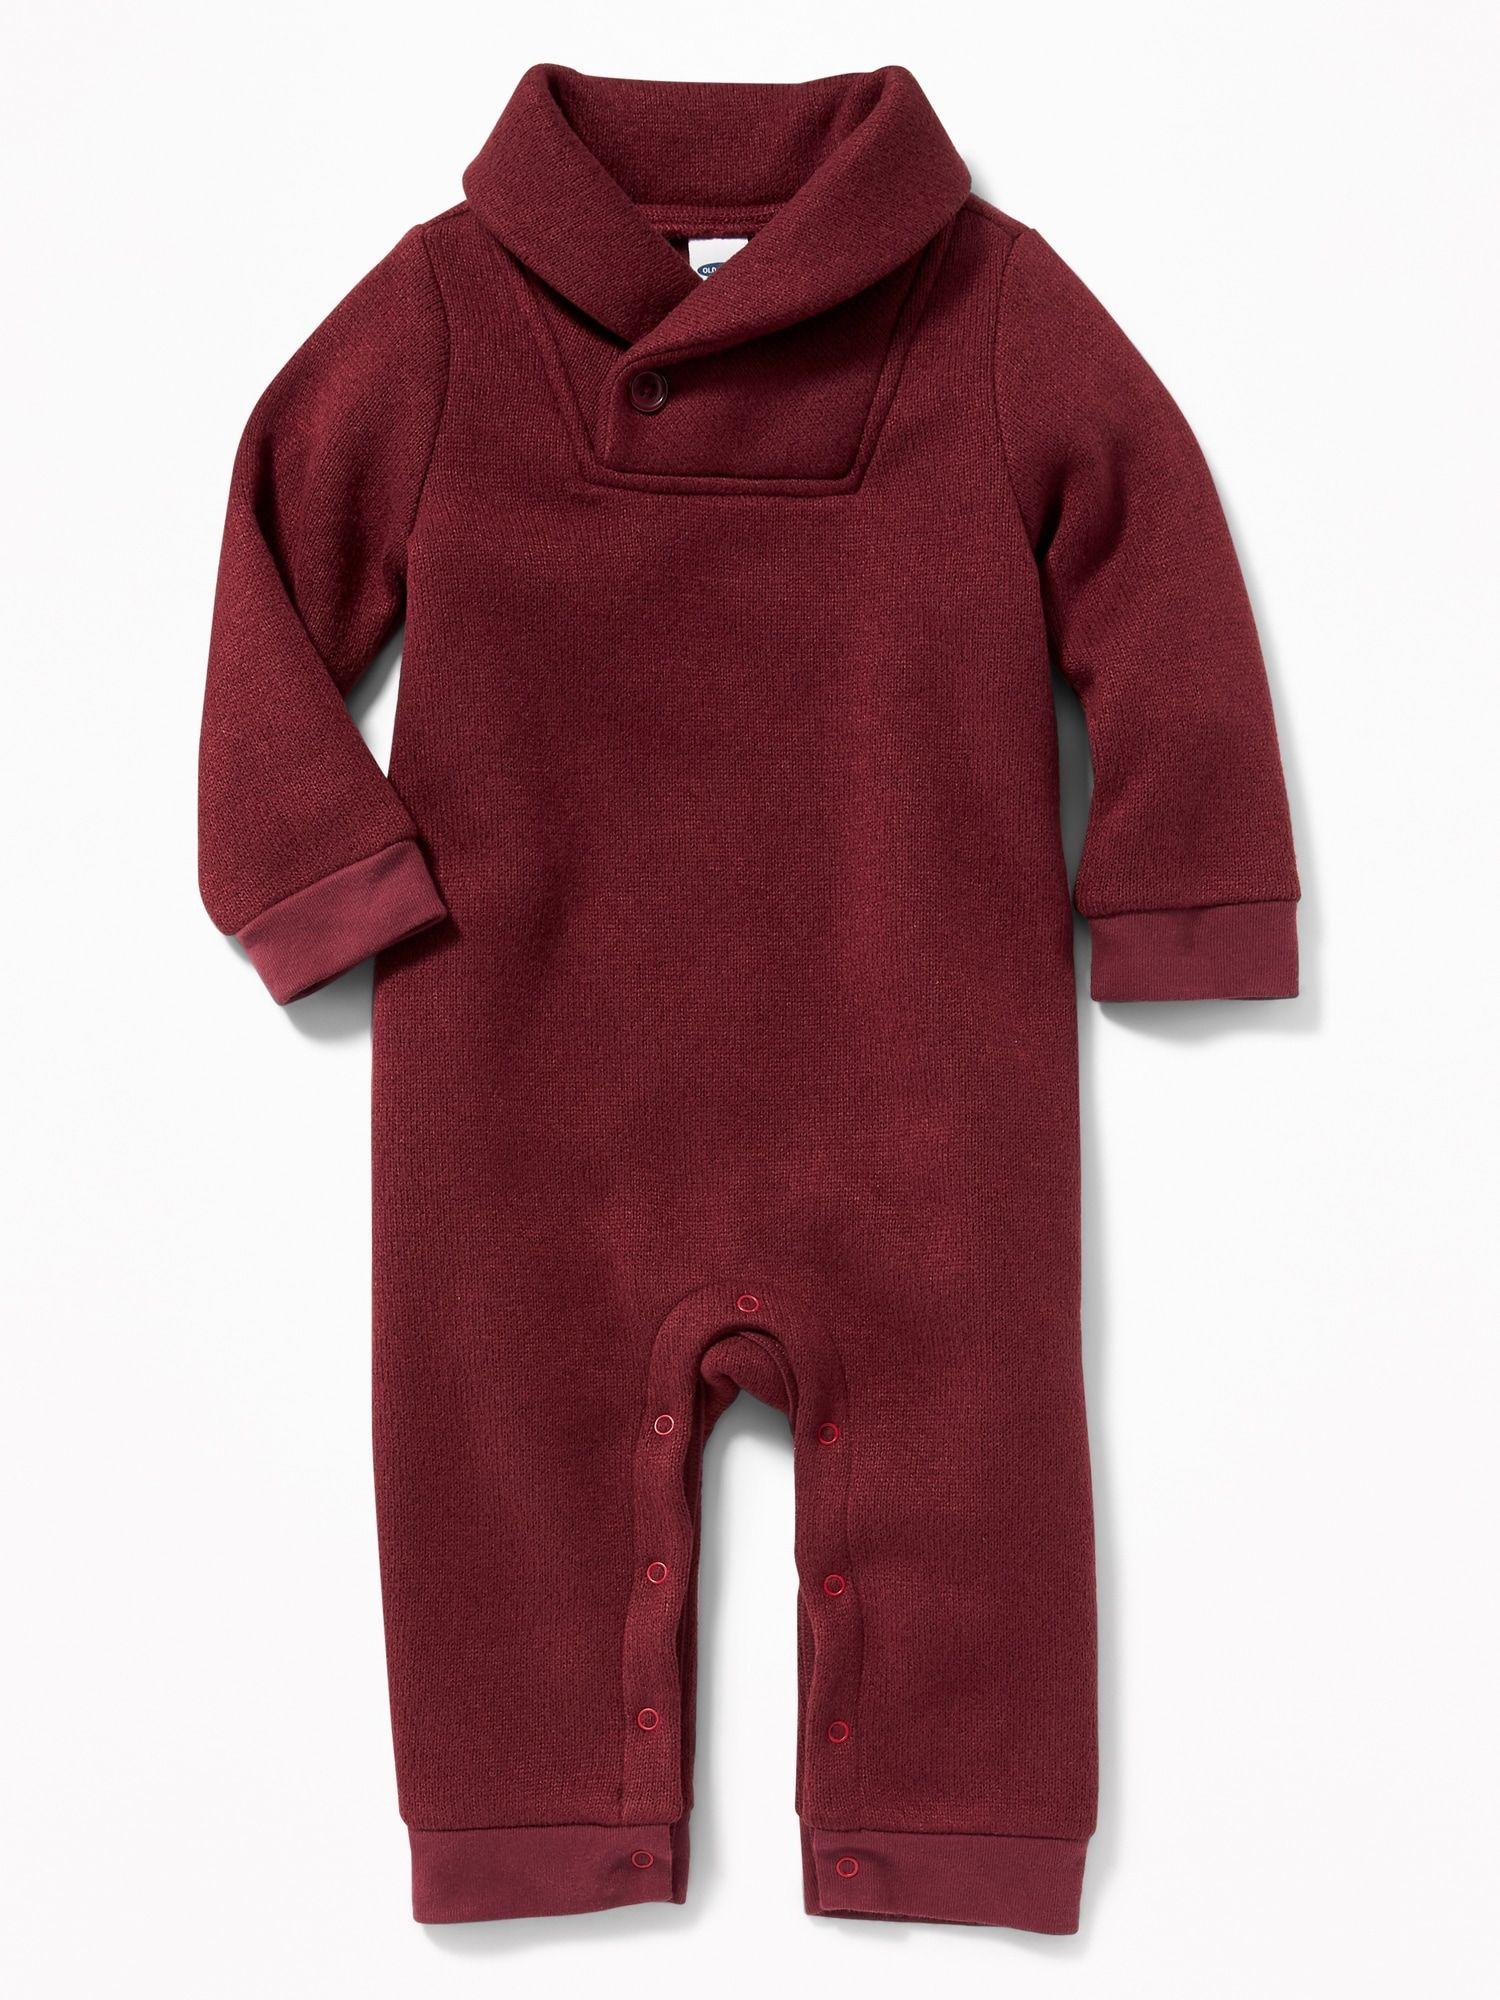 31818e3575a0 Shawl-Collar Sweater-Fleece One-Piece for Baby